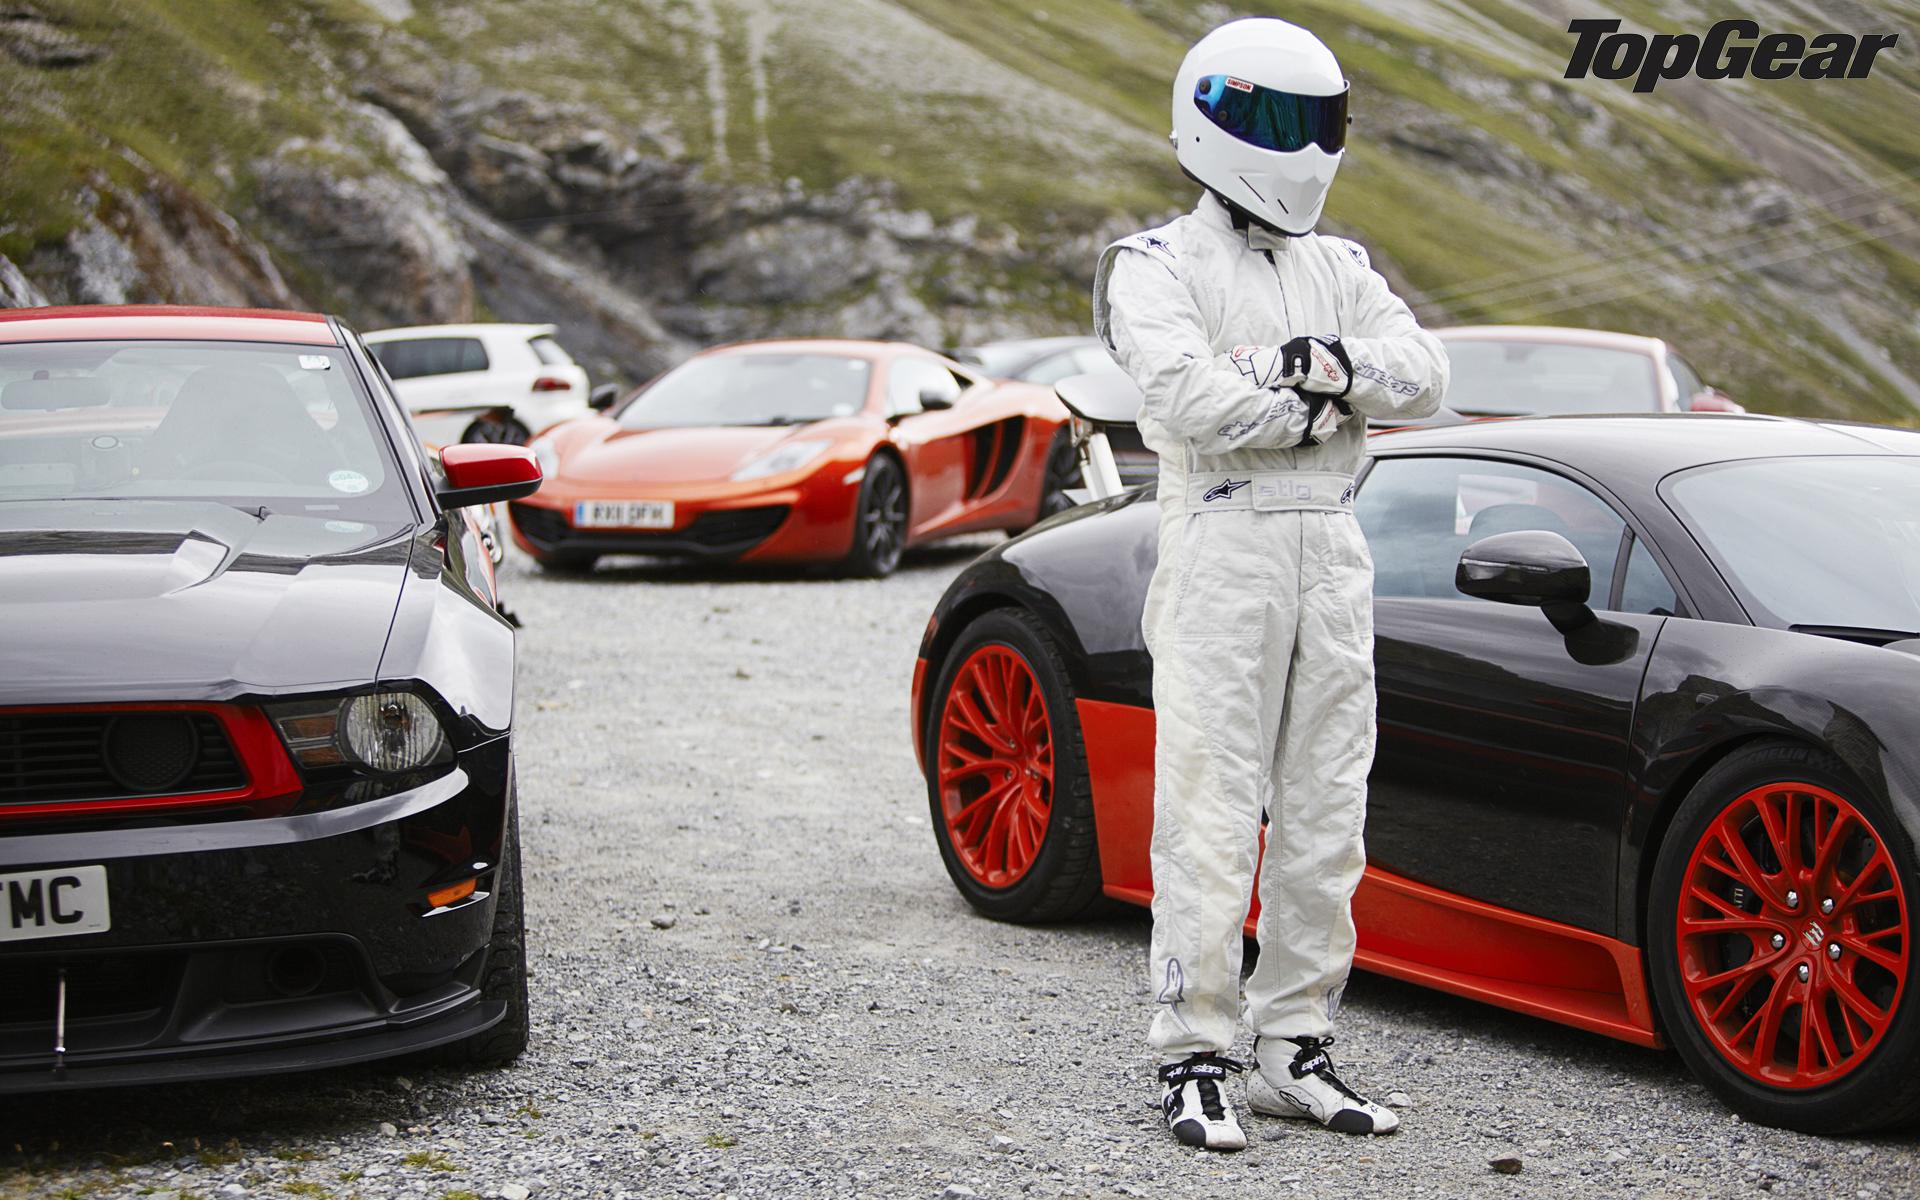 download picture at 1200x1920 - Bugatti Veyron Super Sport Top Gear Wallpaper